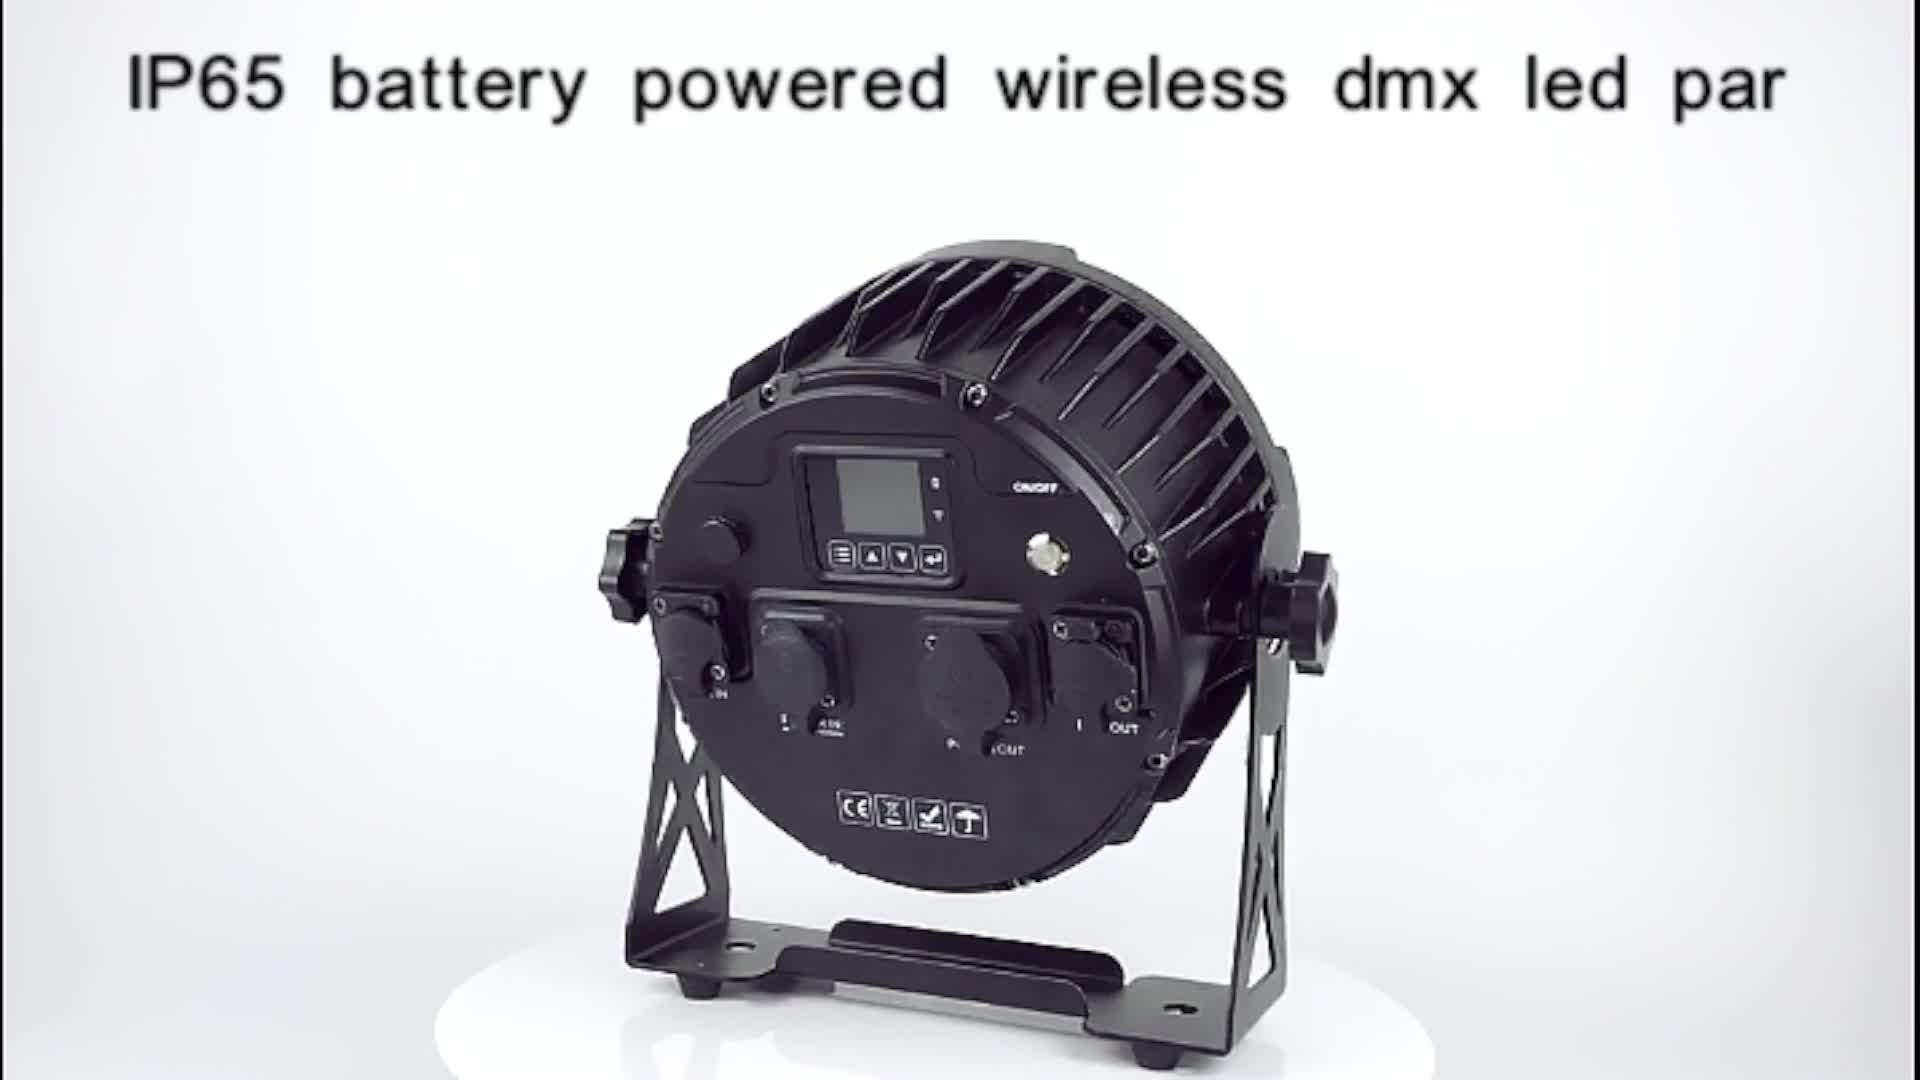 Pars IP65 12pcs 15w Impermeabile Batteria DMX Wireless 6Pars in Ricaricabile Caso di Volo Per Led Par Batteria luce